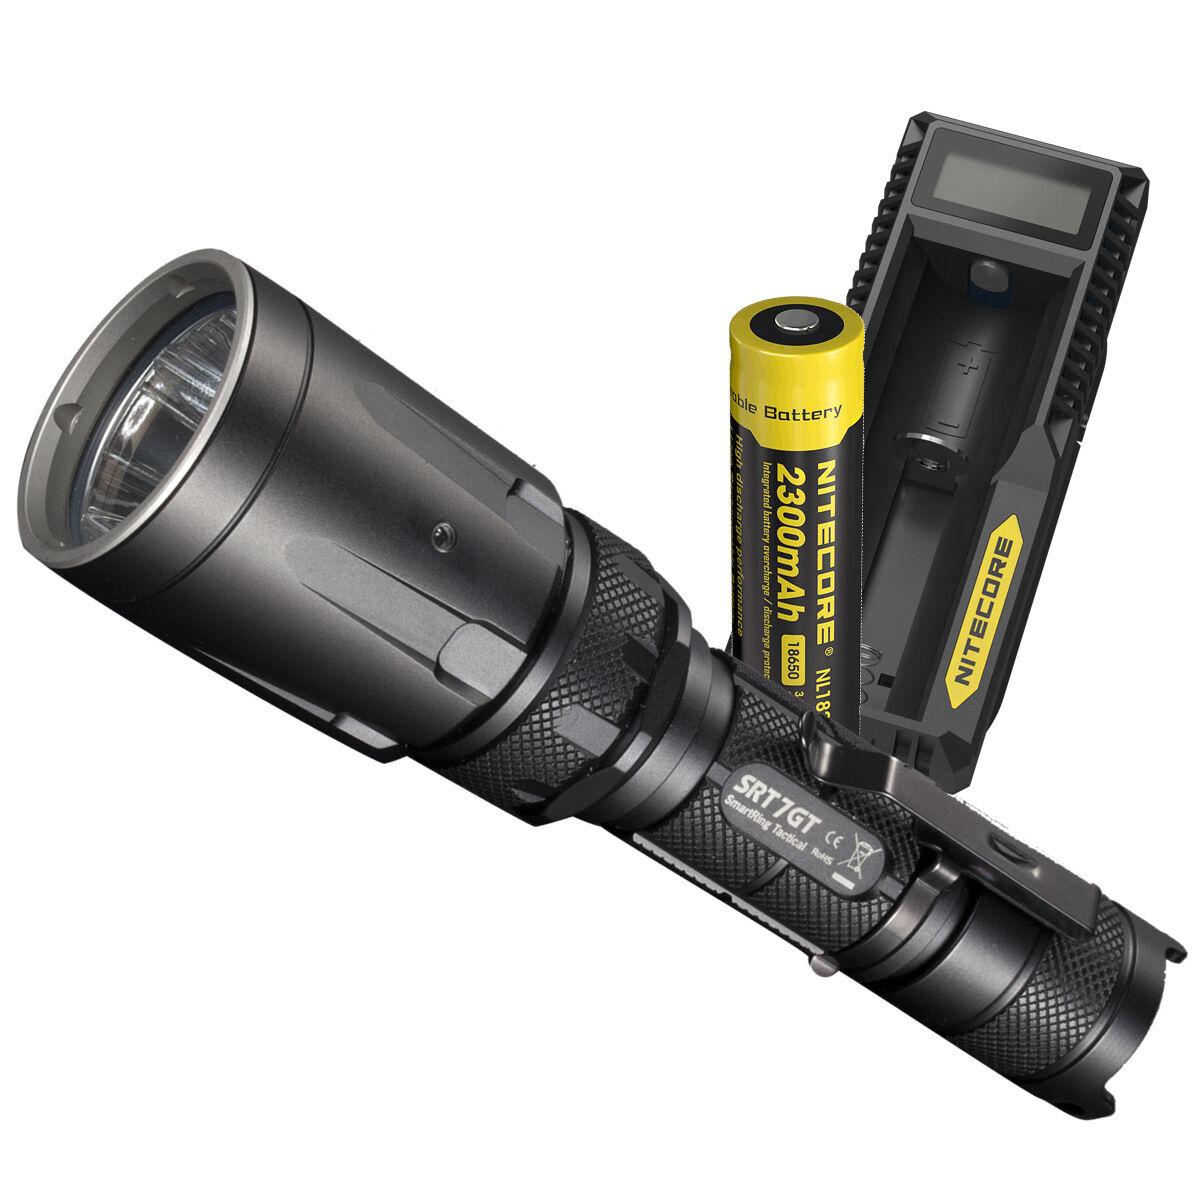 Nitecore SRT7GT 1000 Lumen MultiColoreeee LED Tactical Flashlight w Charging Charging Charging Kit f9096e